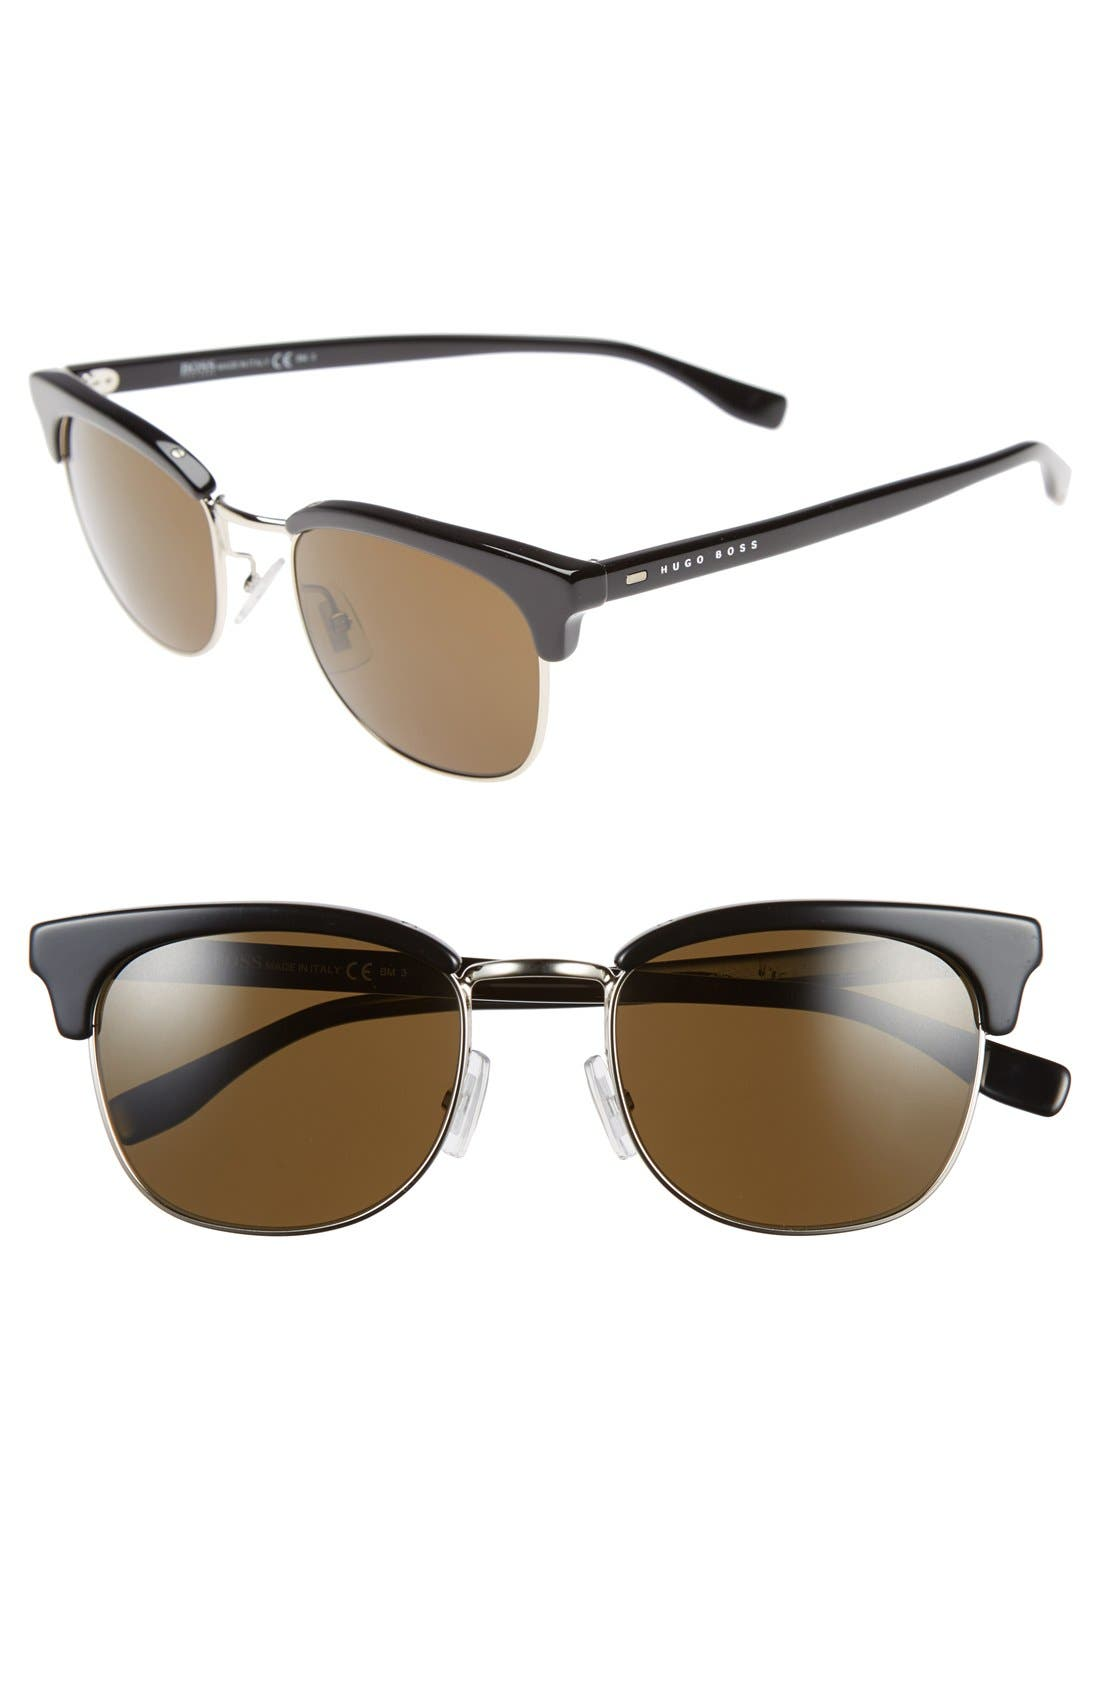 52mm Retro Sunglasses,                             Main thumbnail 1, color,                             Black/ Pale Gold/ Brown